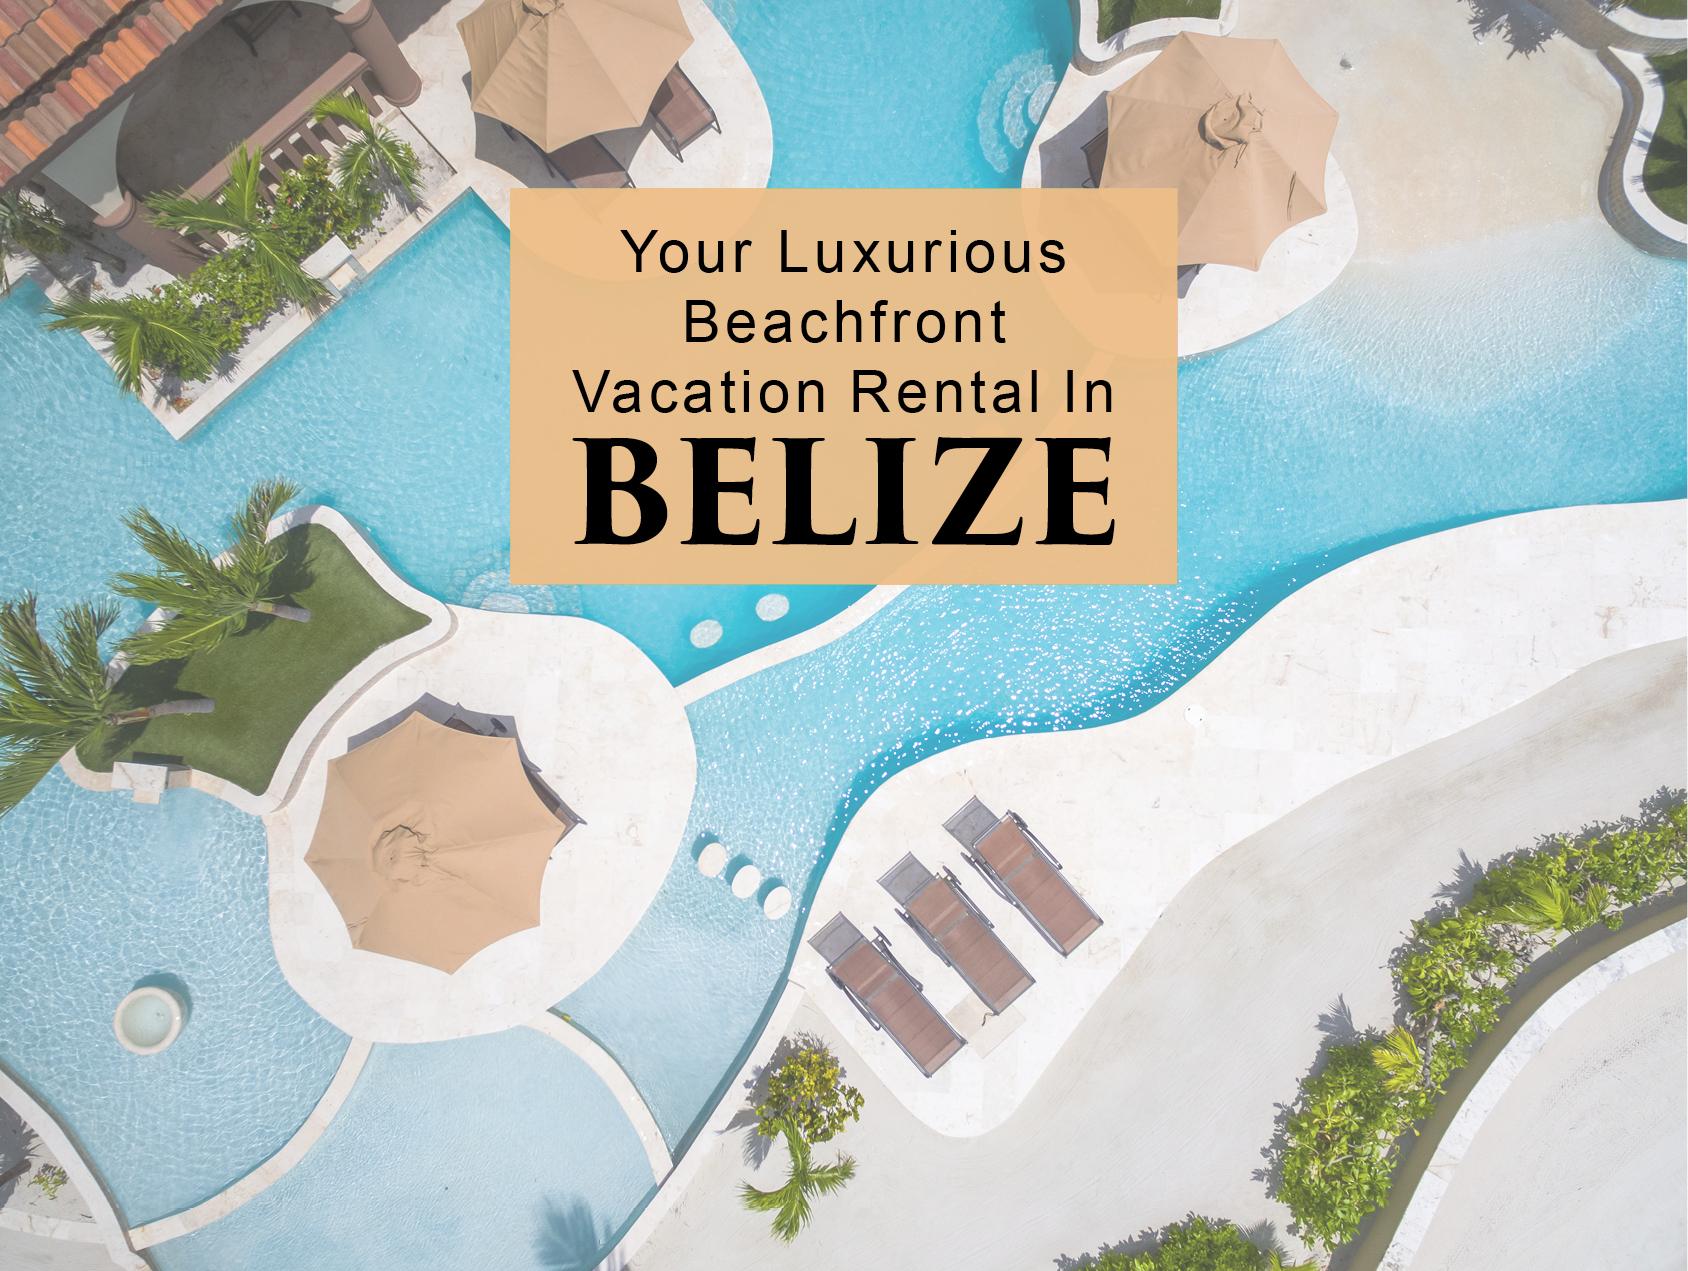 luxurious_beachfront_vacation_rental